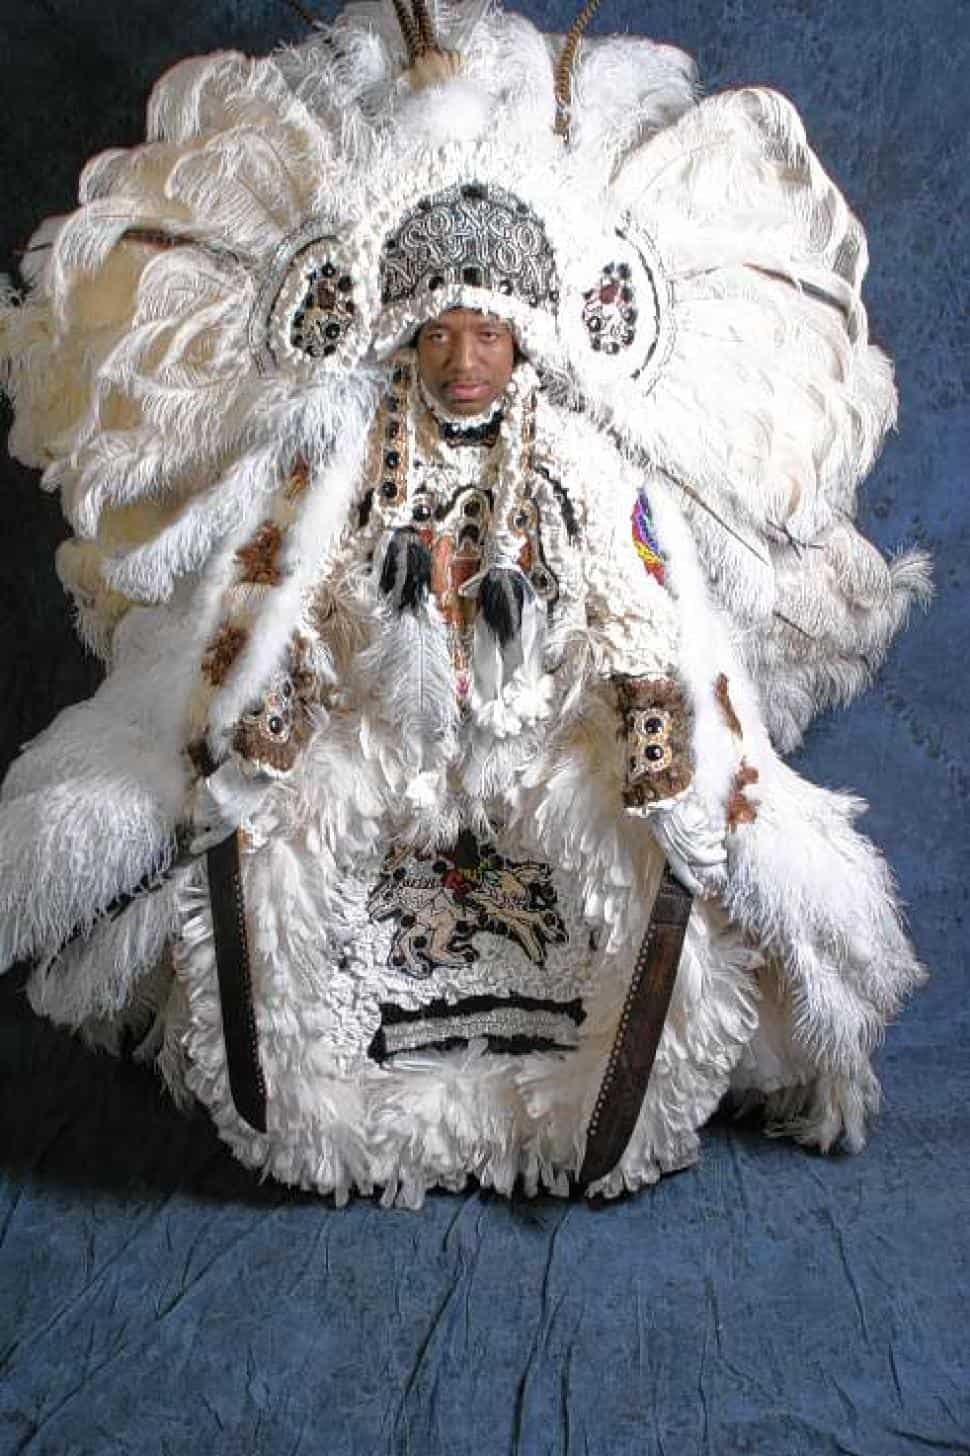 Treme New Orleans- Big Chief Donald Harrison Jr via